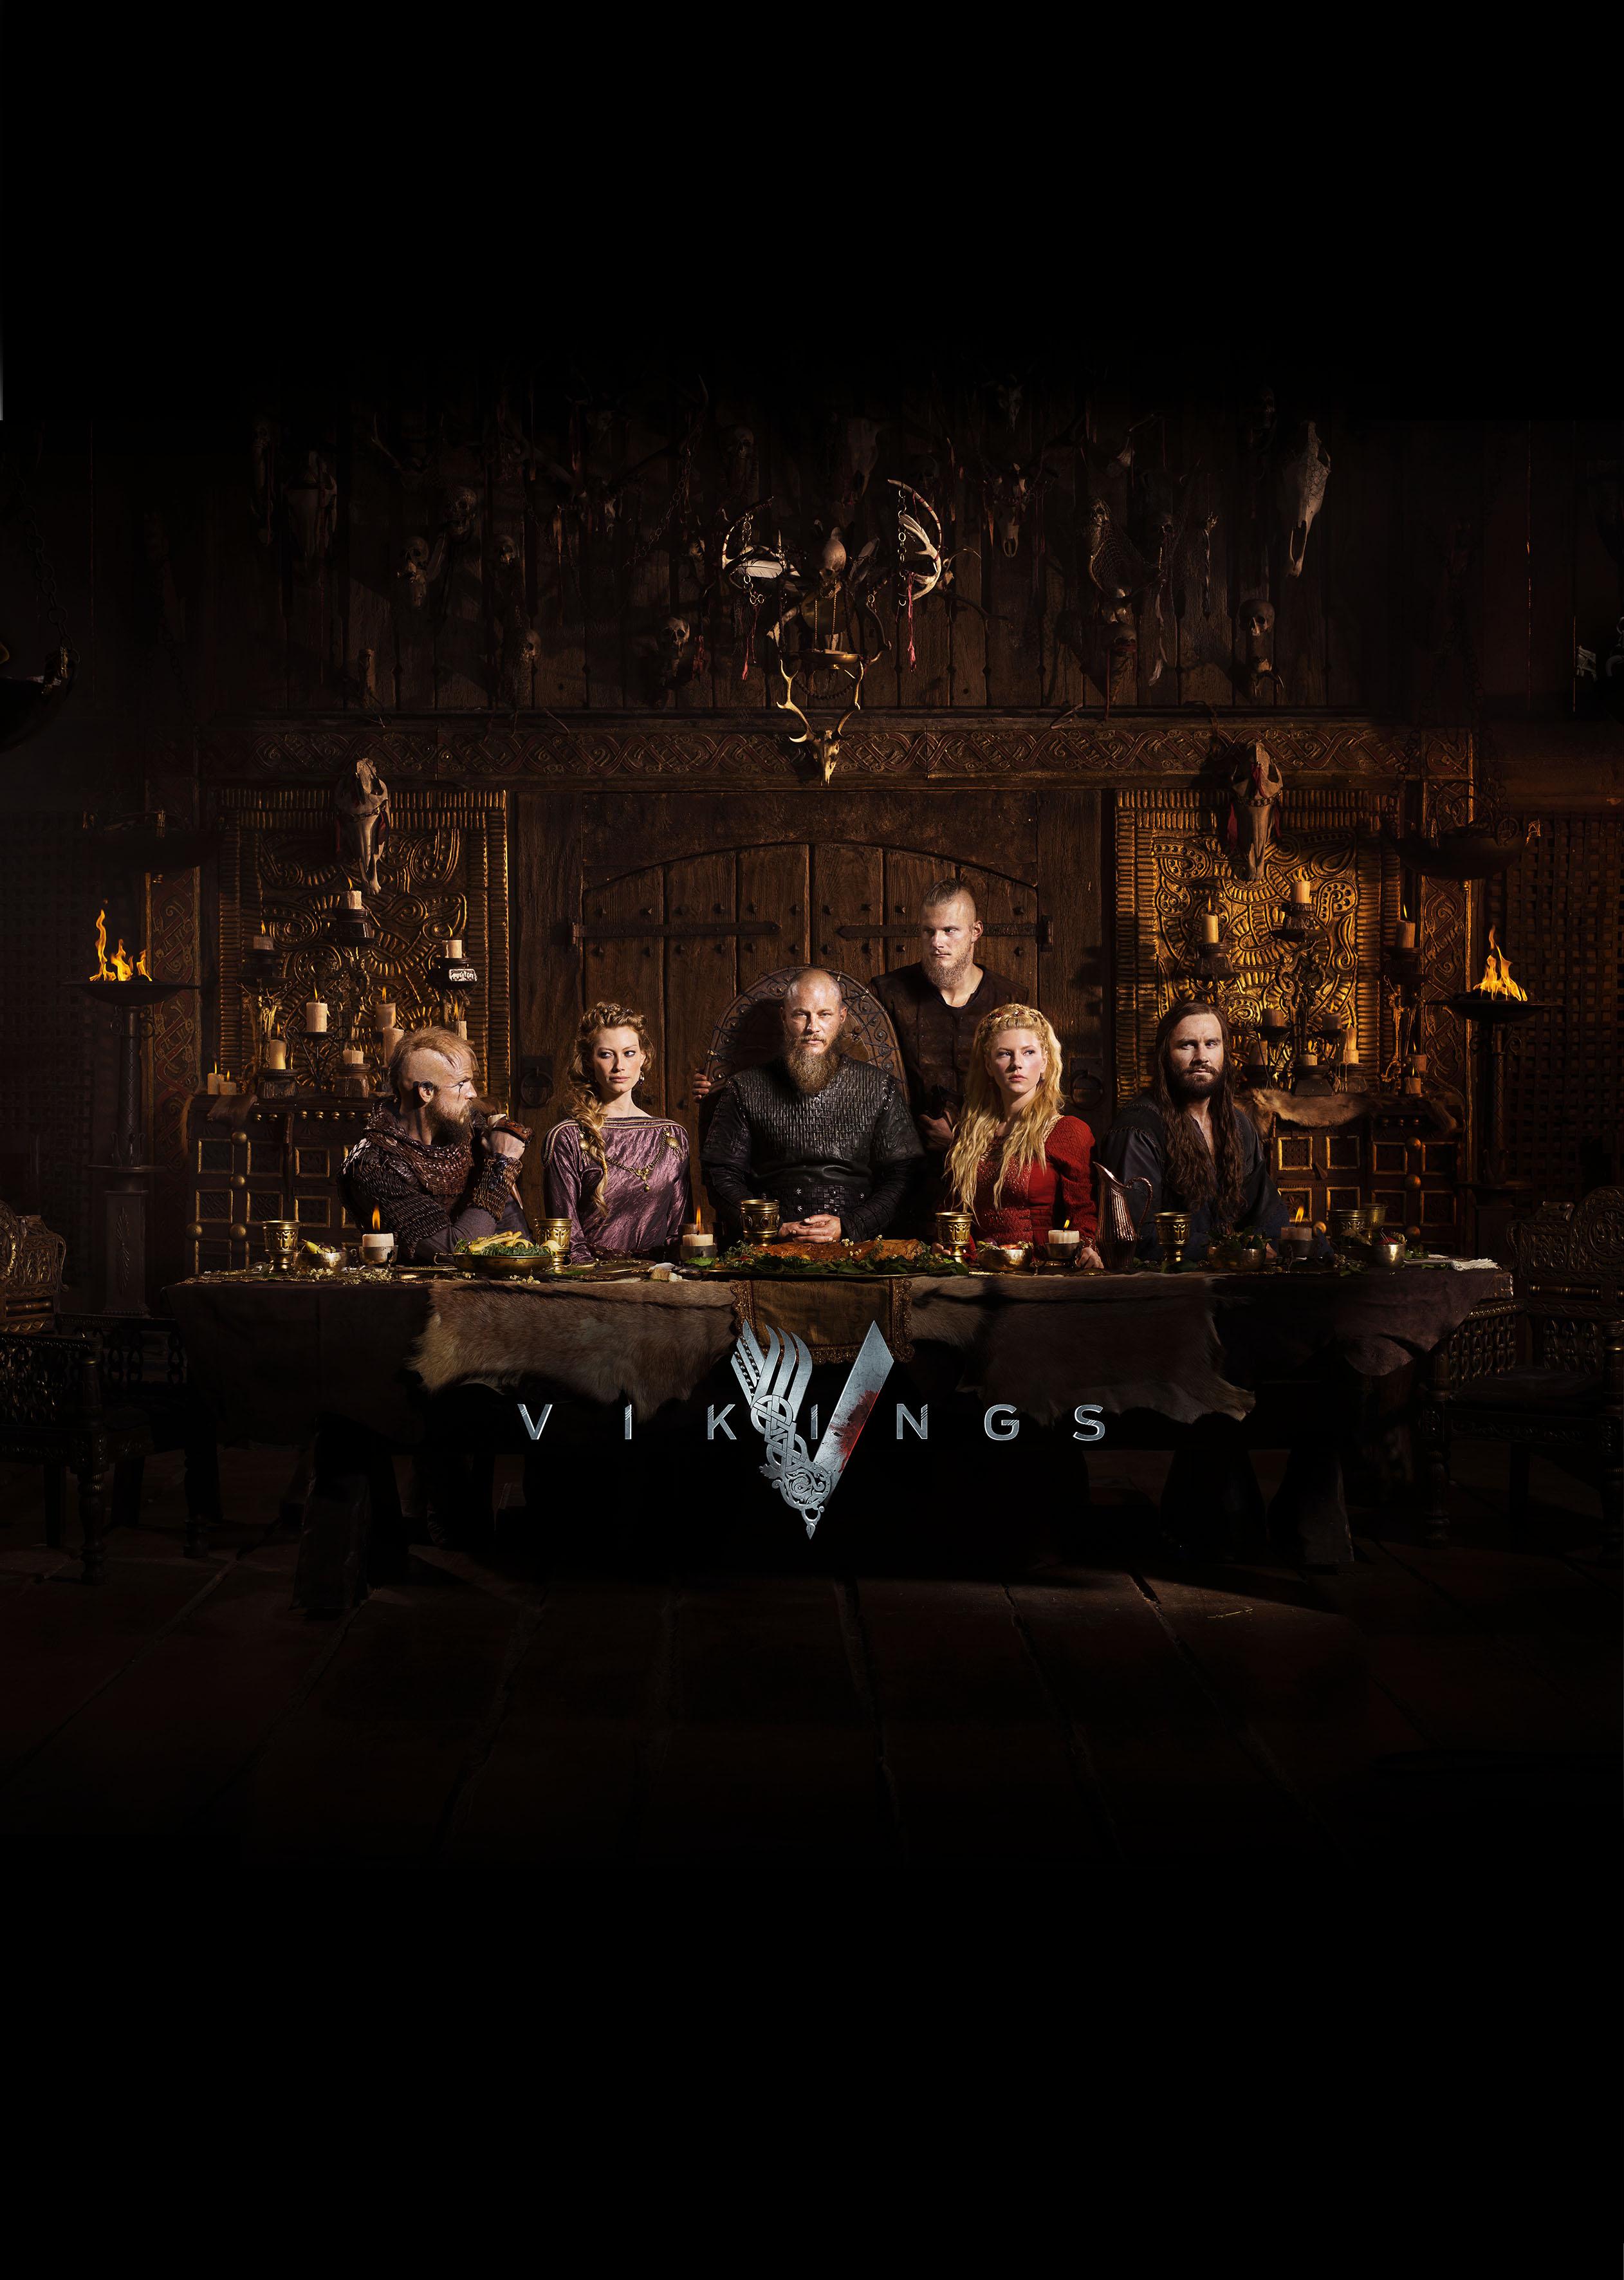 vikings season 4 episode 20 free online